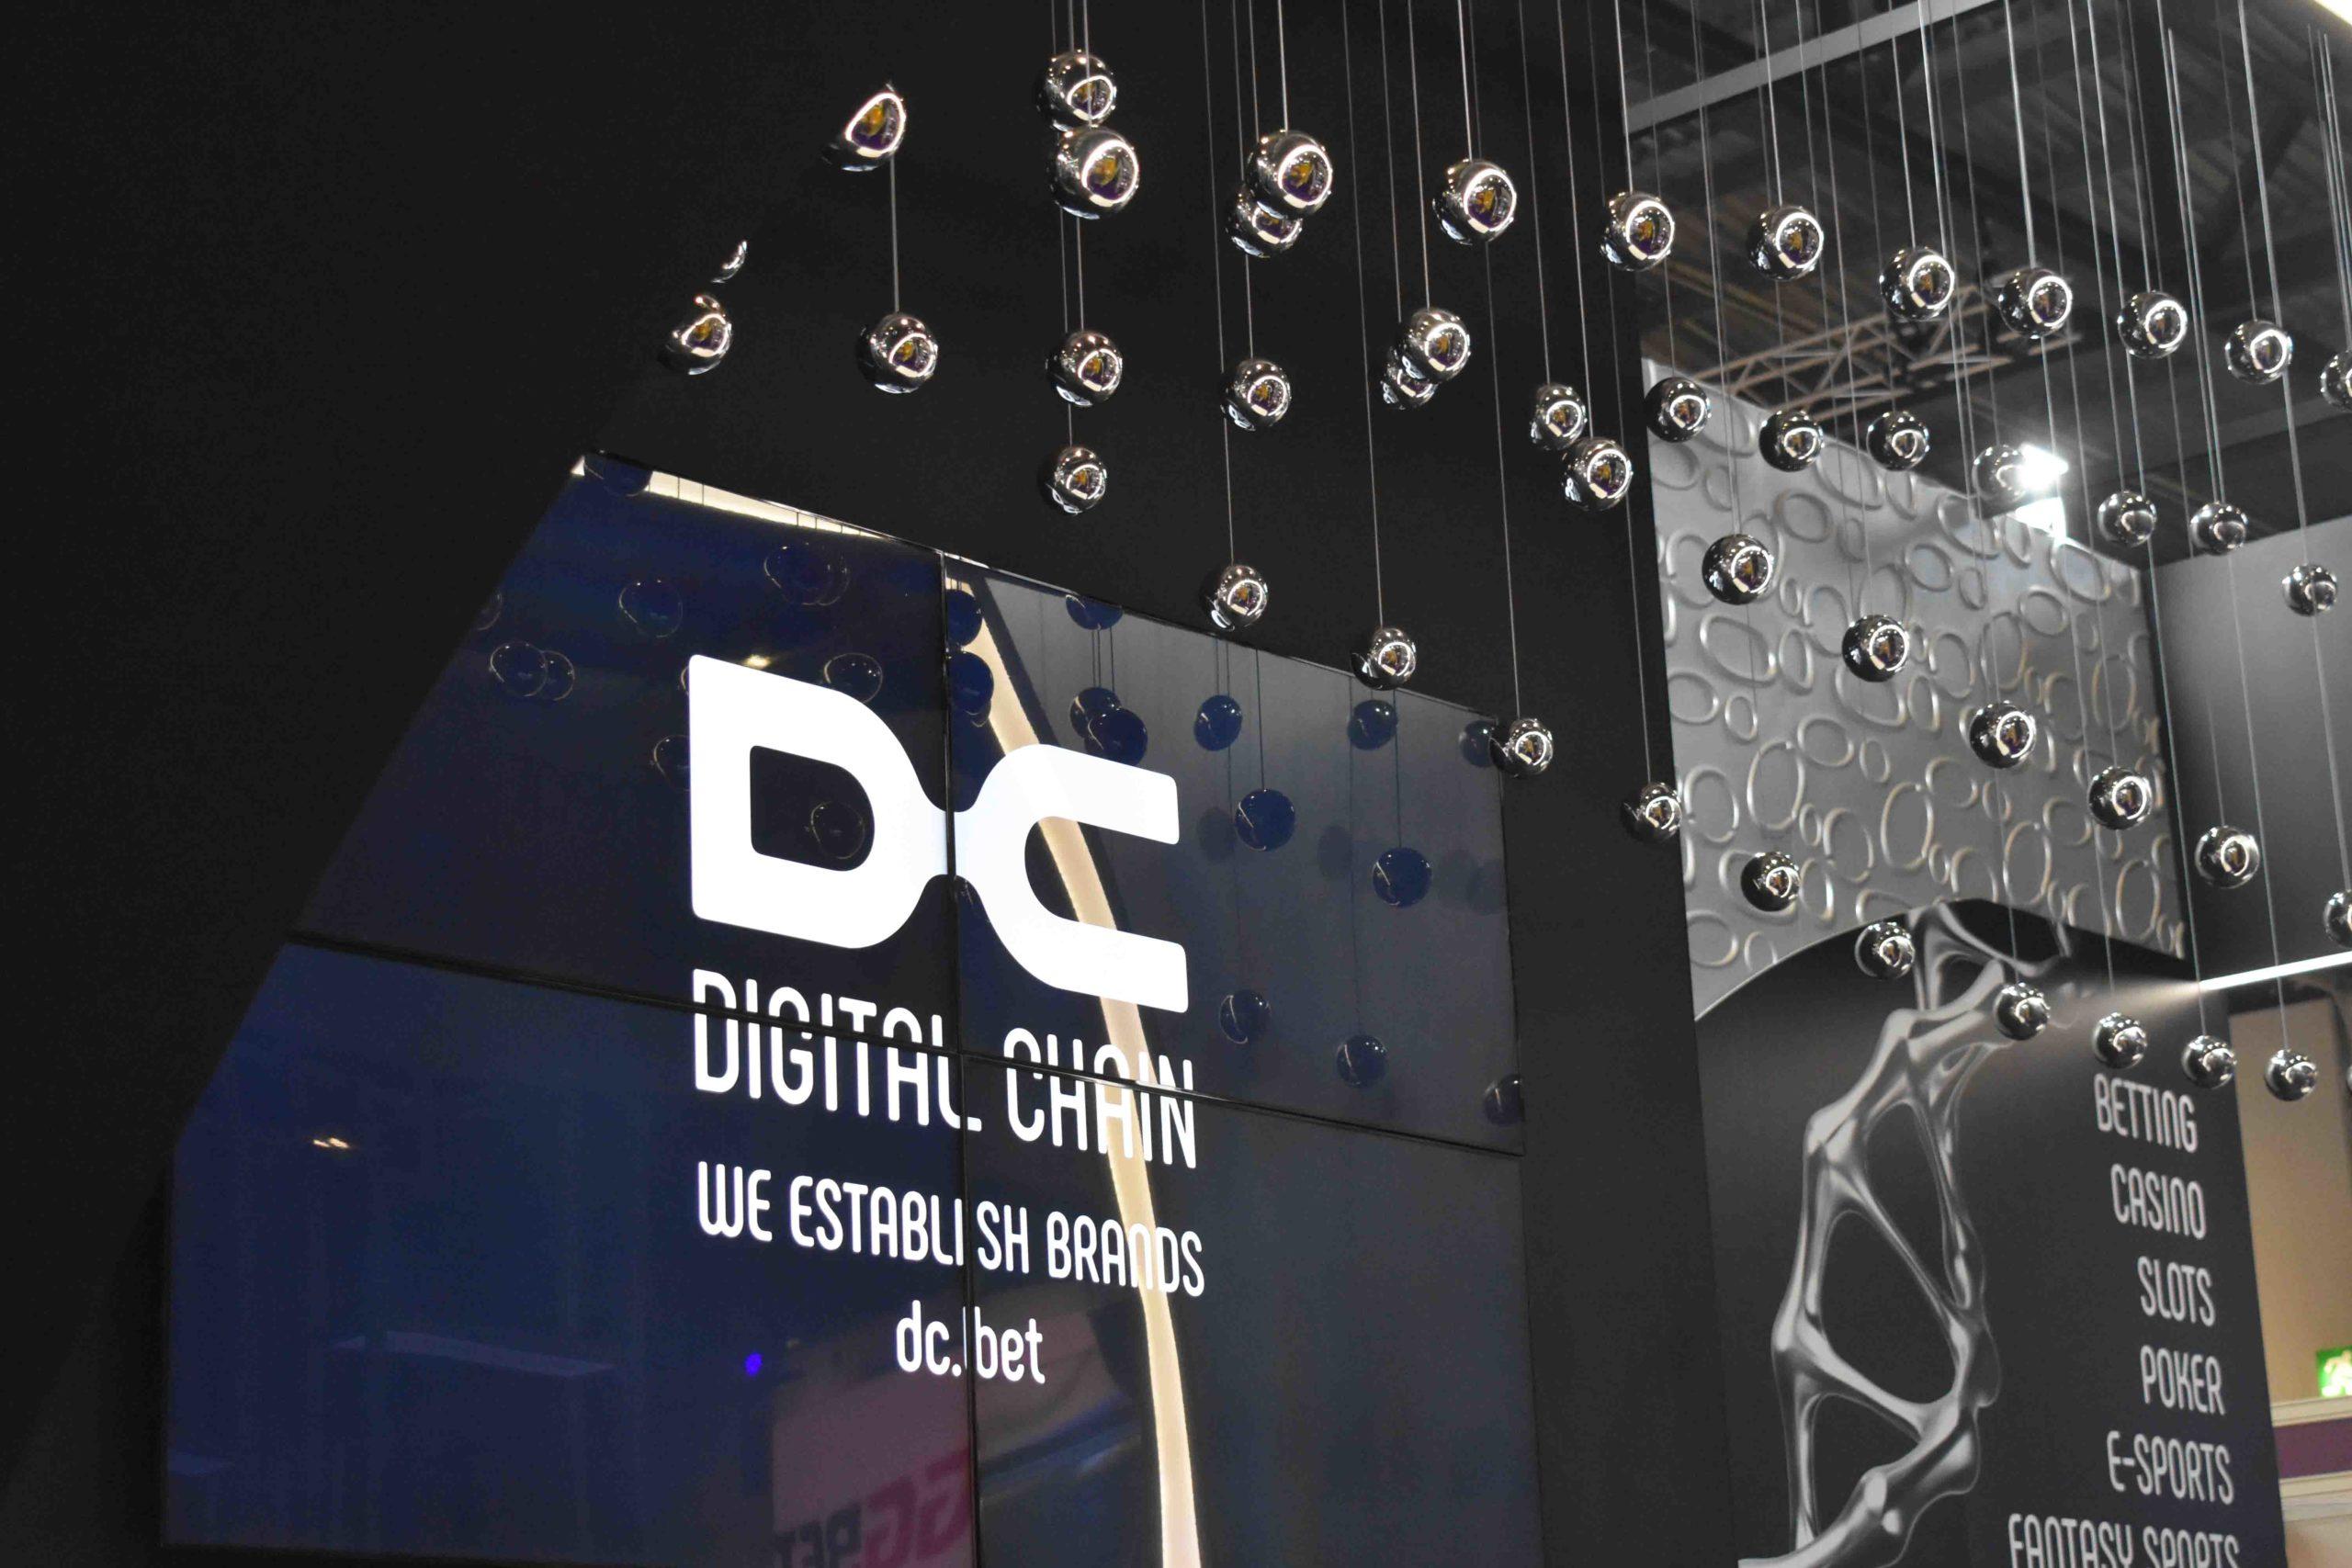 dc exhibition build